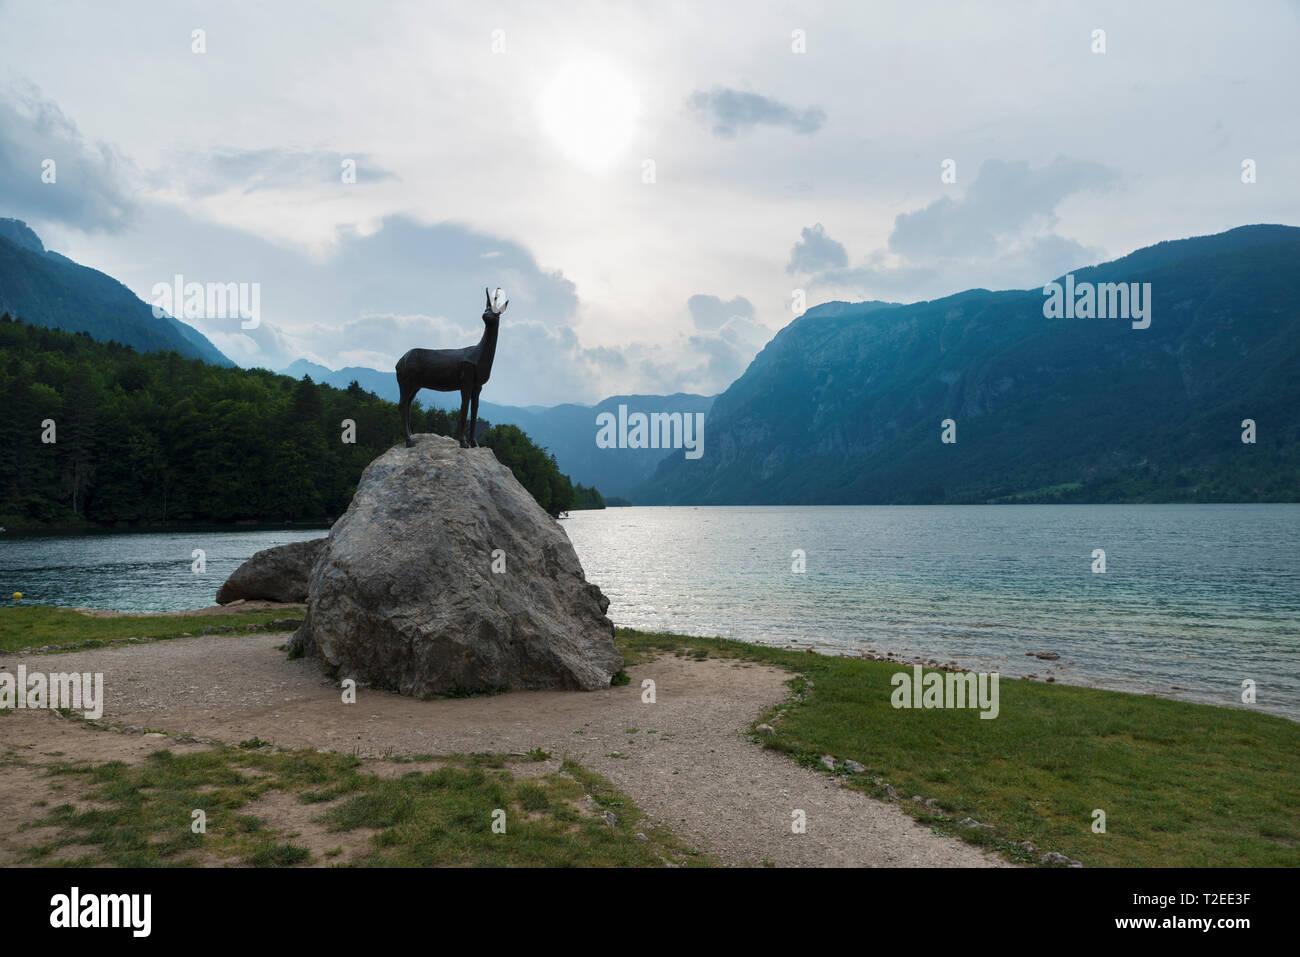 21 June 2018 Slovenia Idyllic scene of Julian Alps mountain and  Bohinj lake in Triglav national park in Slovenia on sunset Selective focus - Stock Image